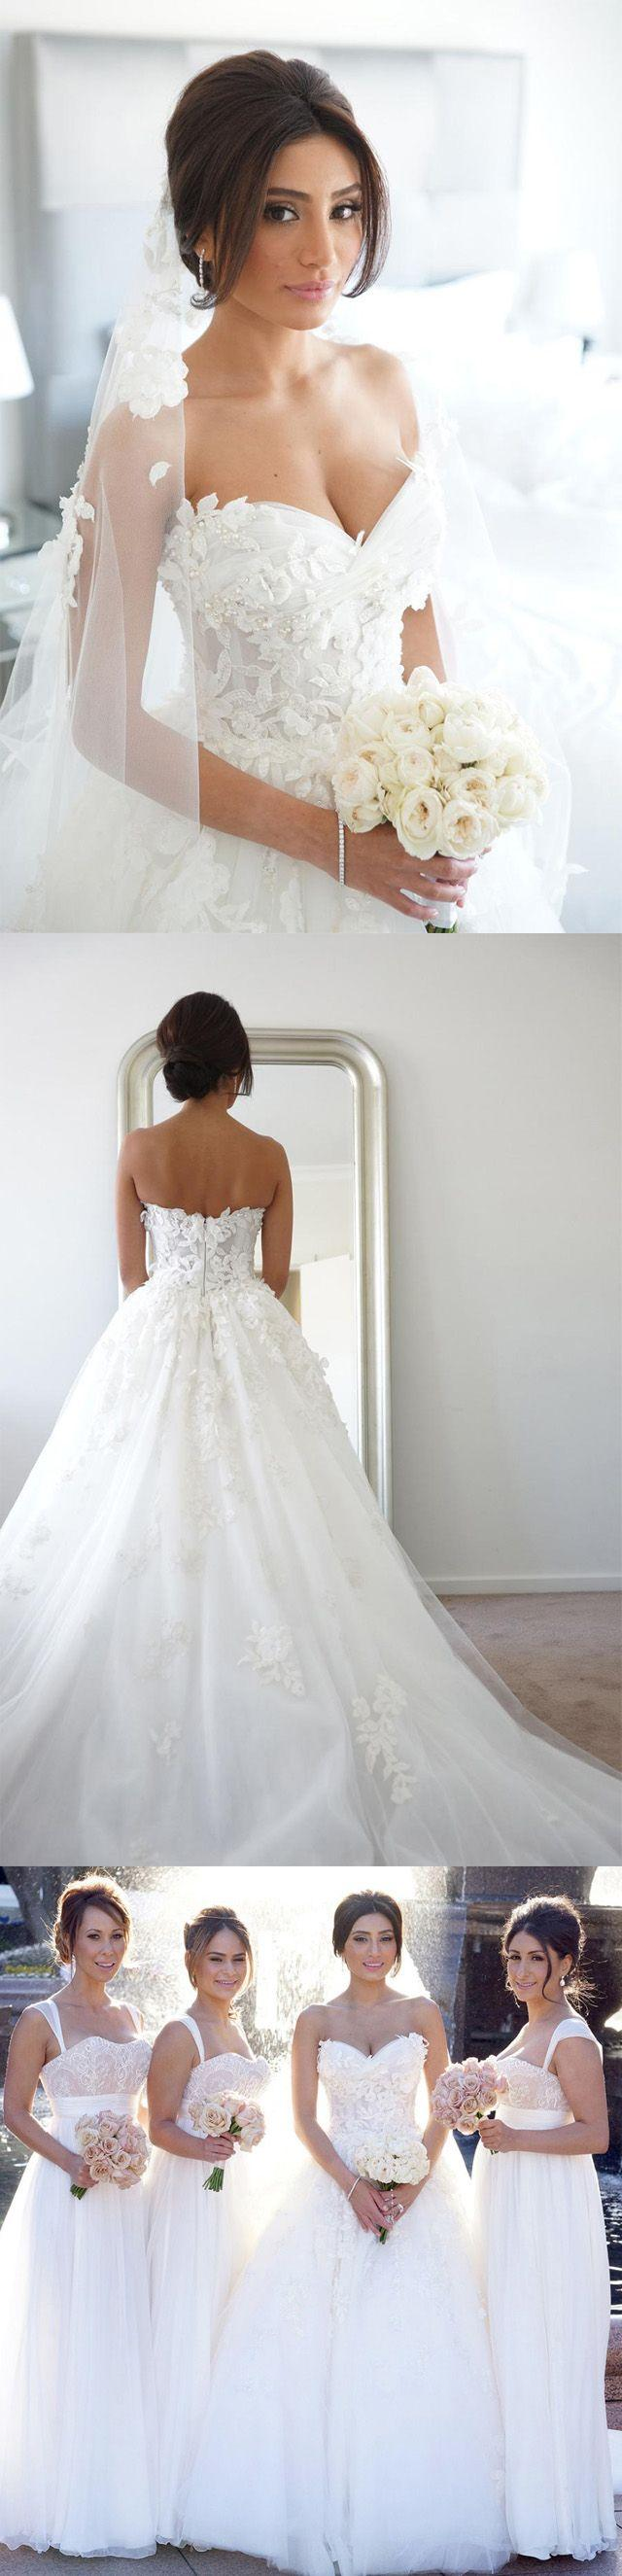 Hochzeit - Amazing Outfits